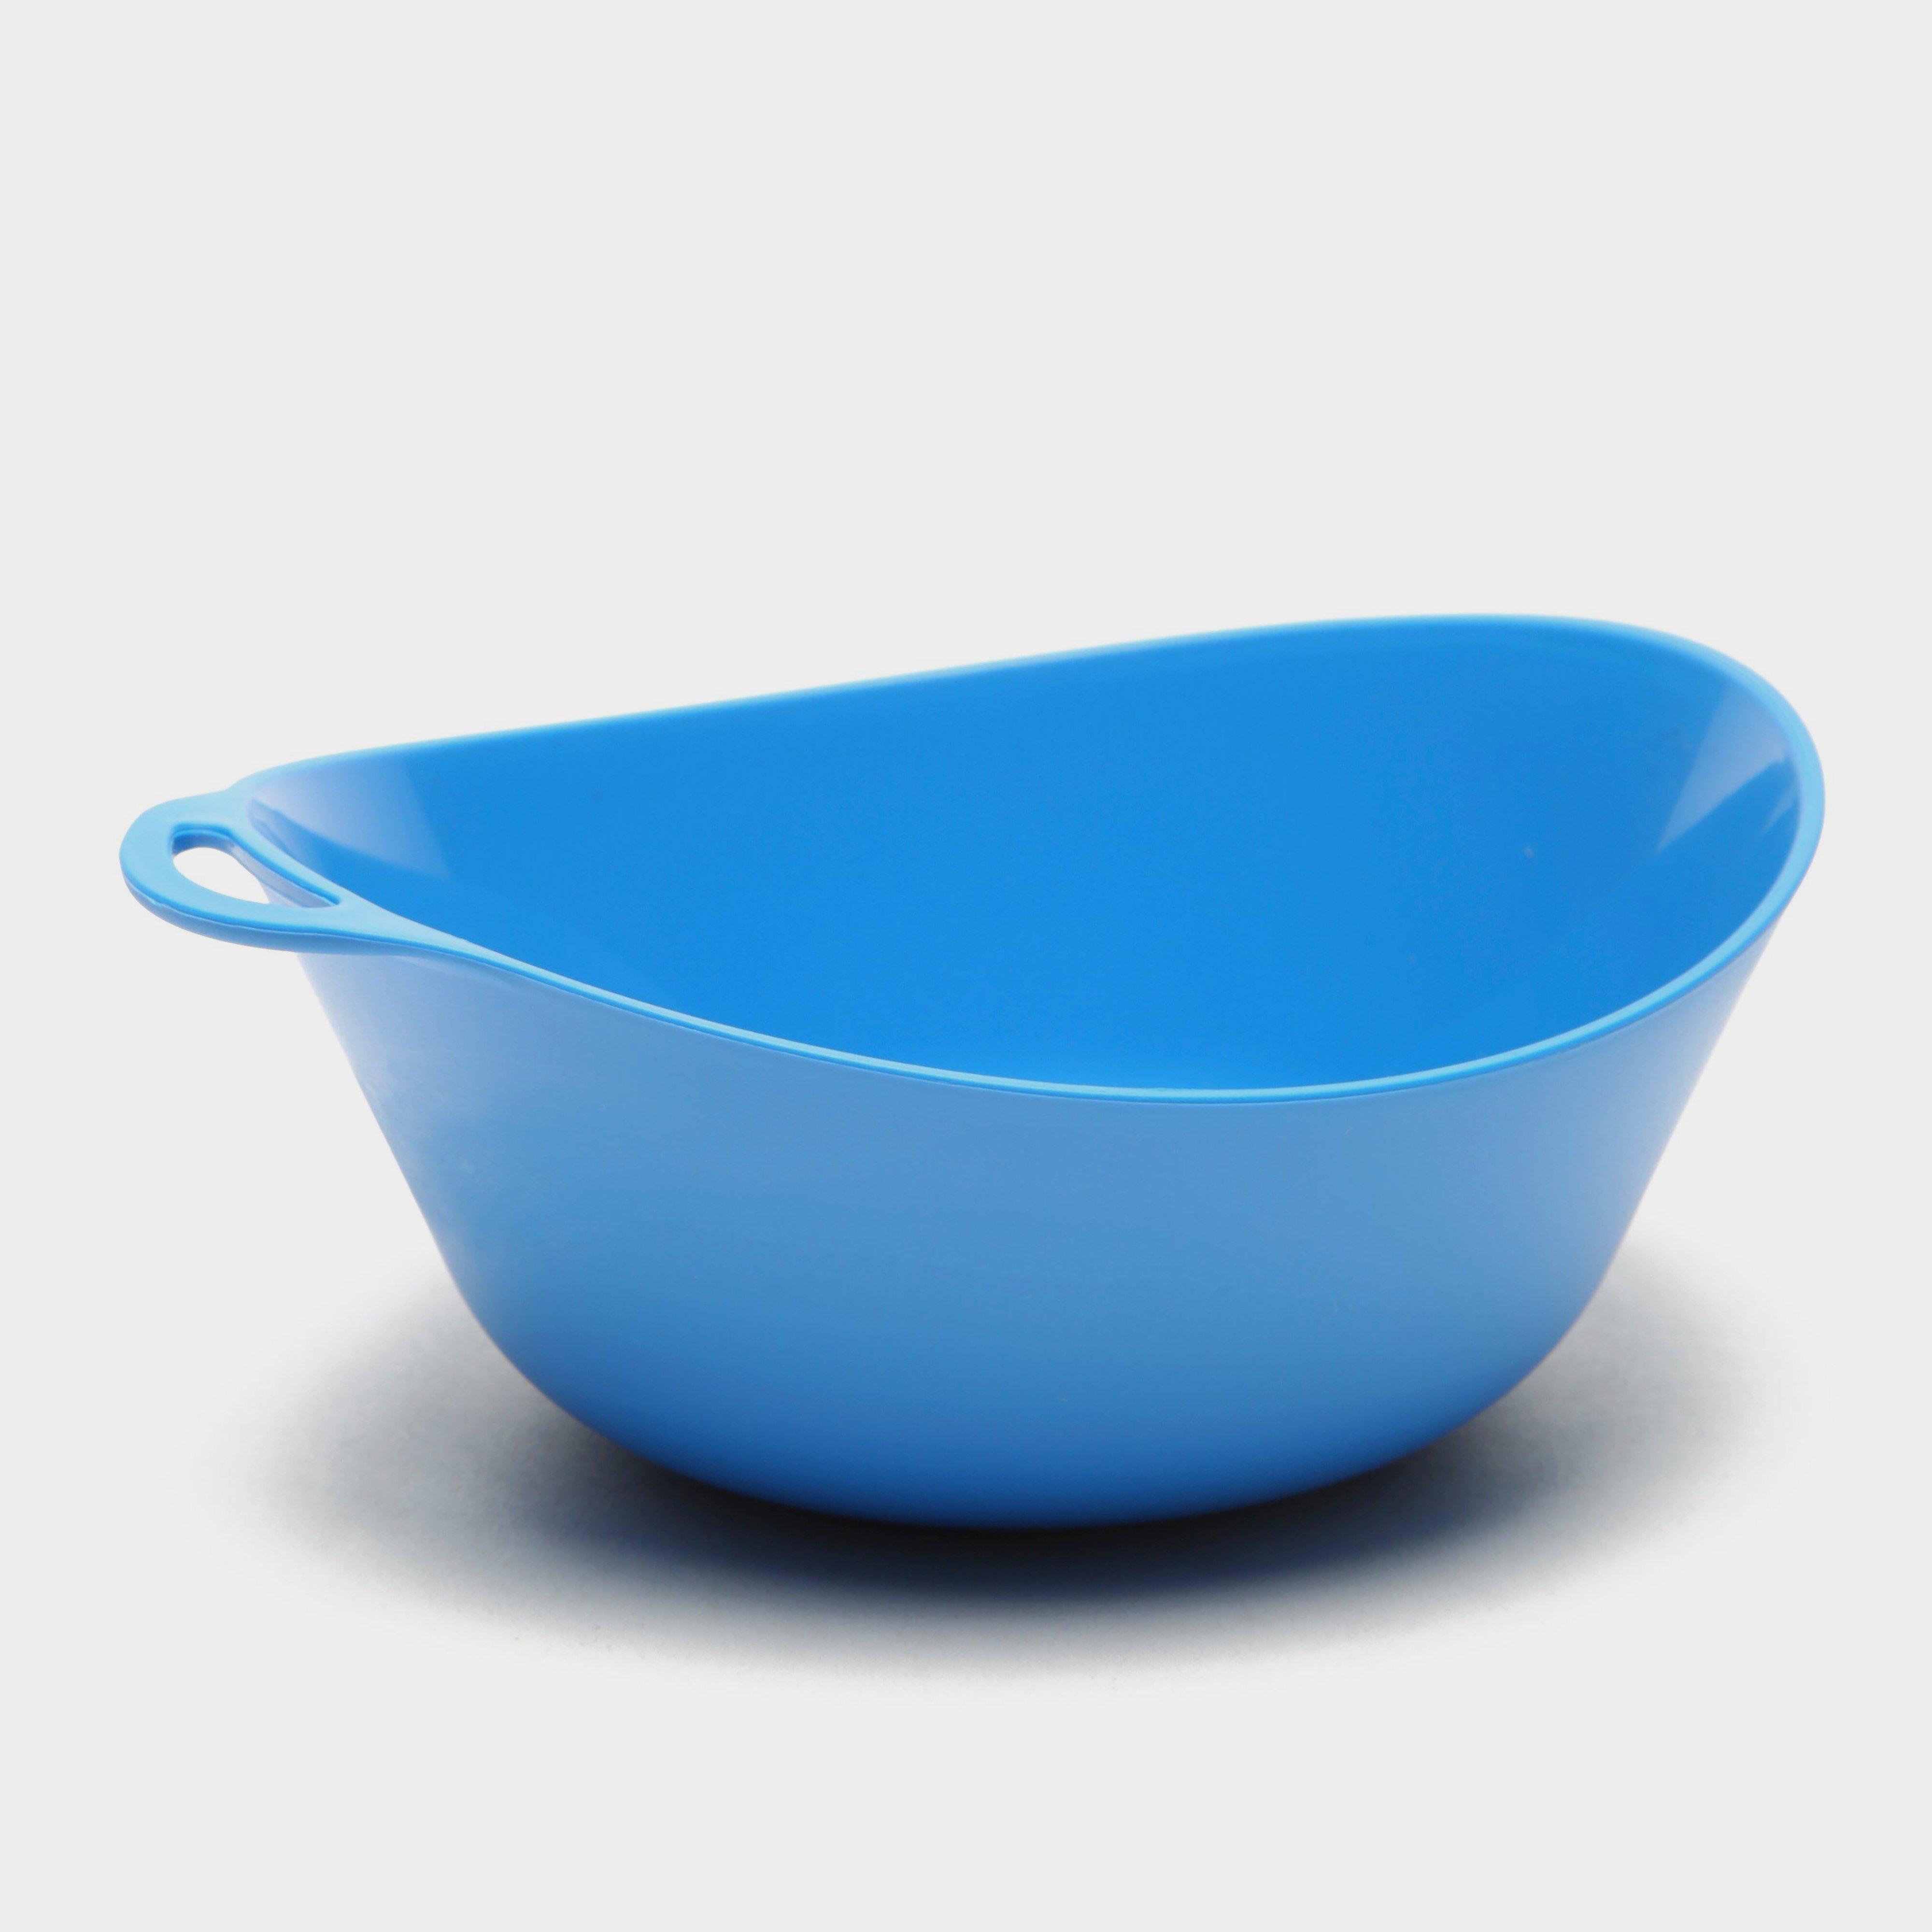 Lifeventure Lifeventure Ellipse Bowl - Blue, Blue